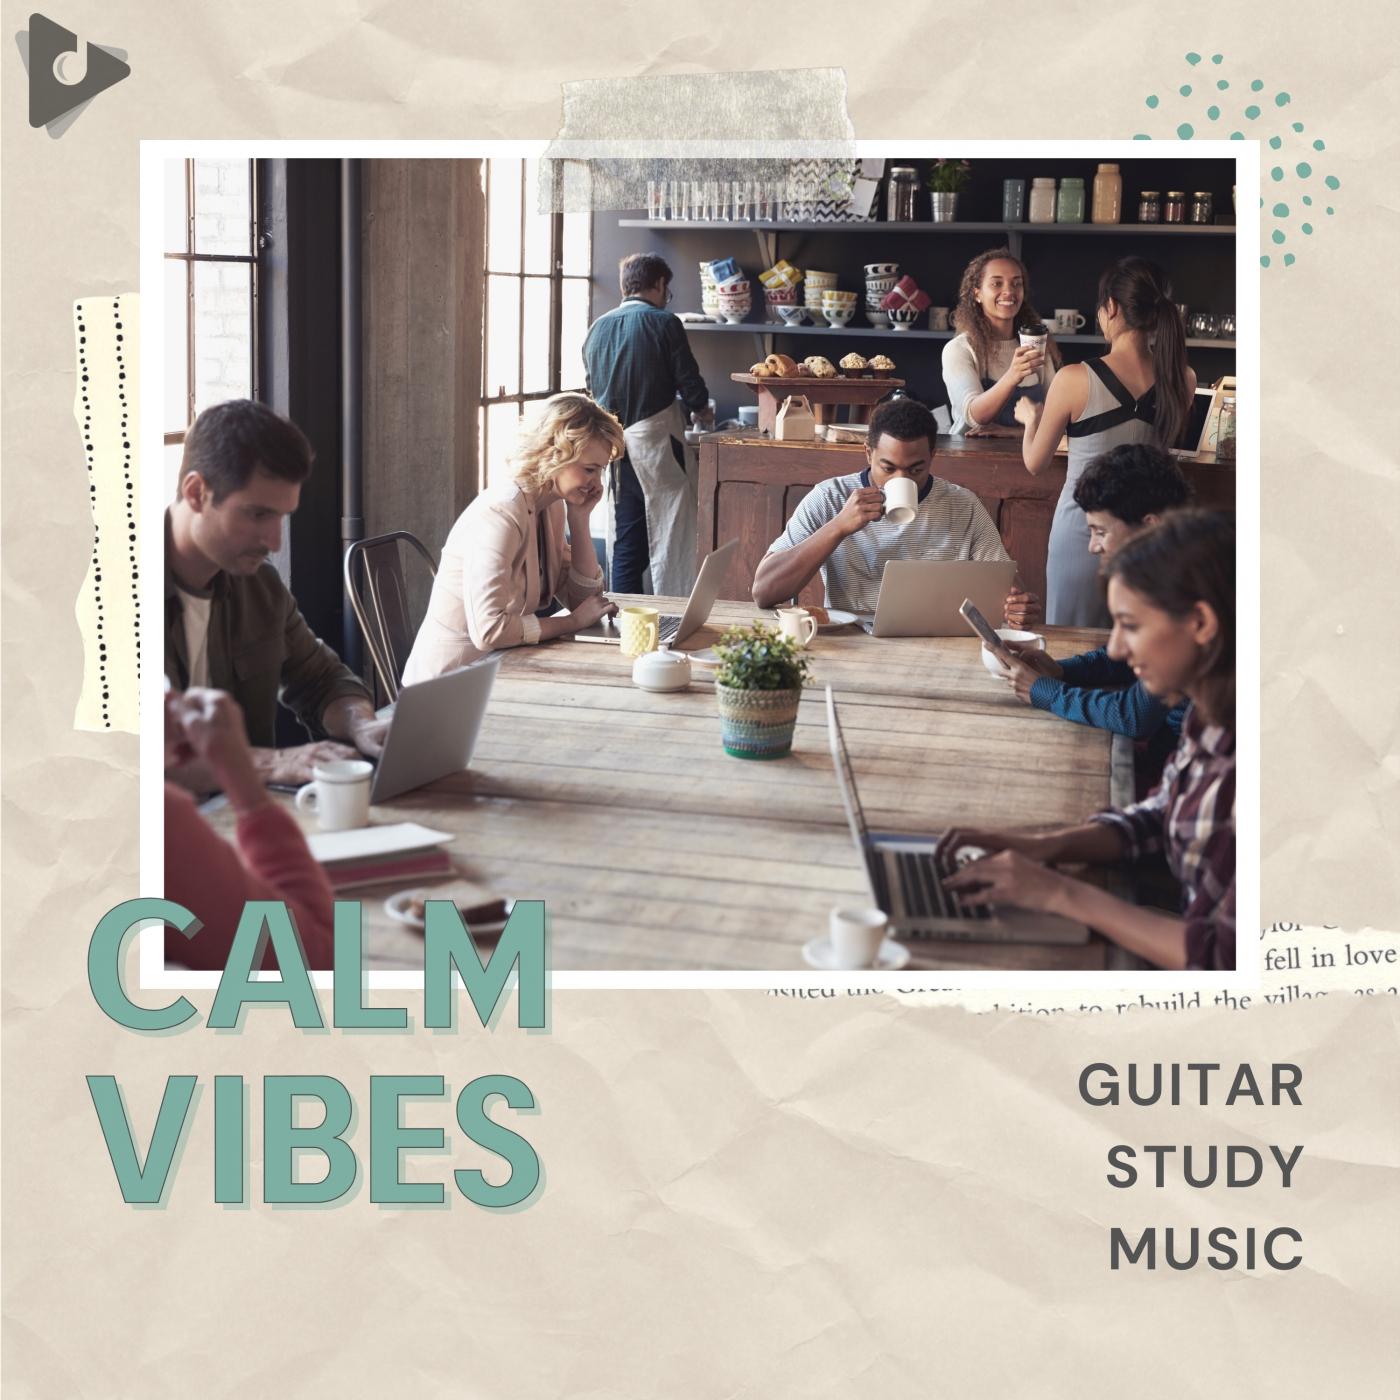 Guitar Study Music